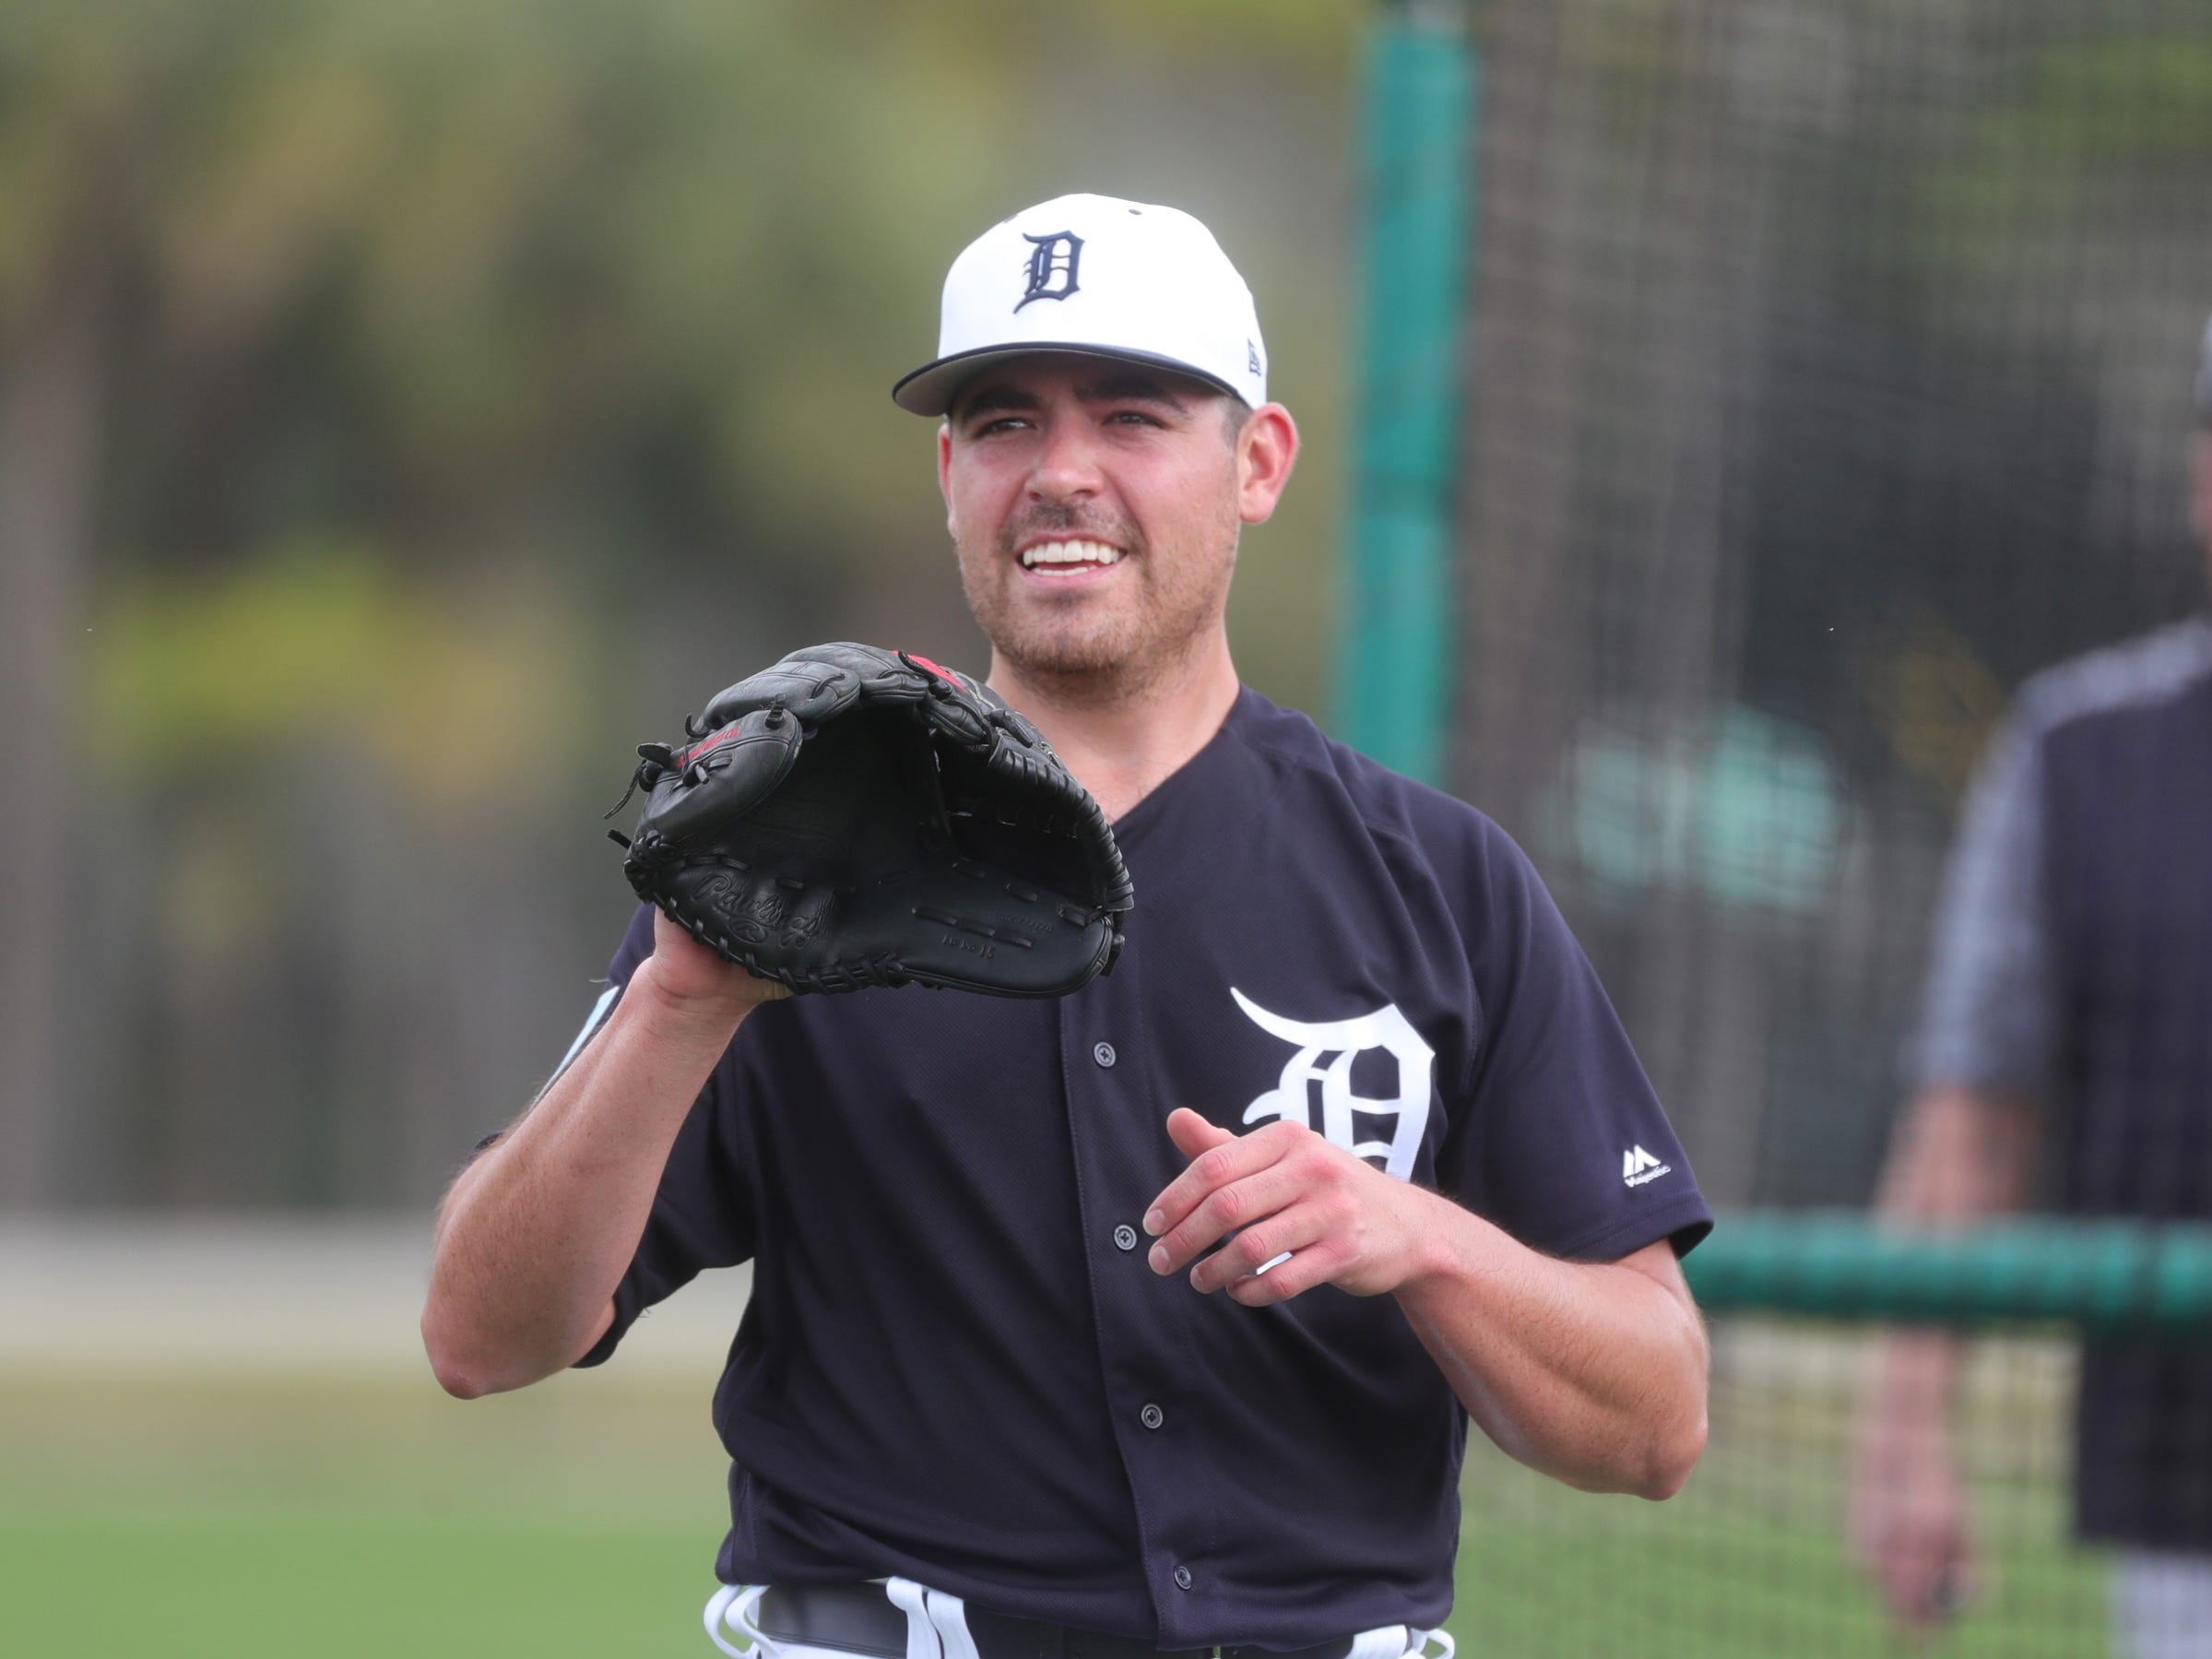 Detroit Tigers pitcher Matt Moore throws batting practice Monday, Feb. 18, 2019 at Joker Marchant Stadium in Lakeland, Fla.